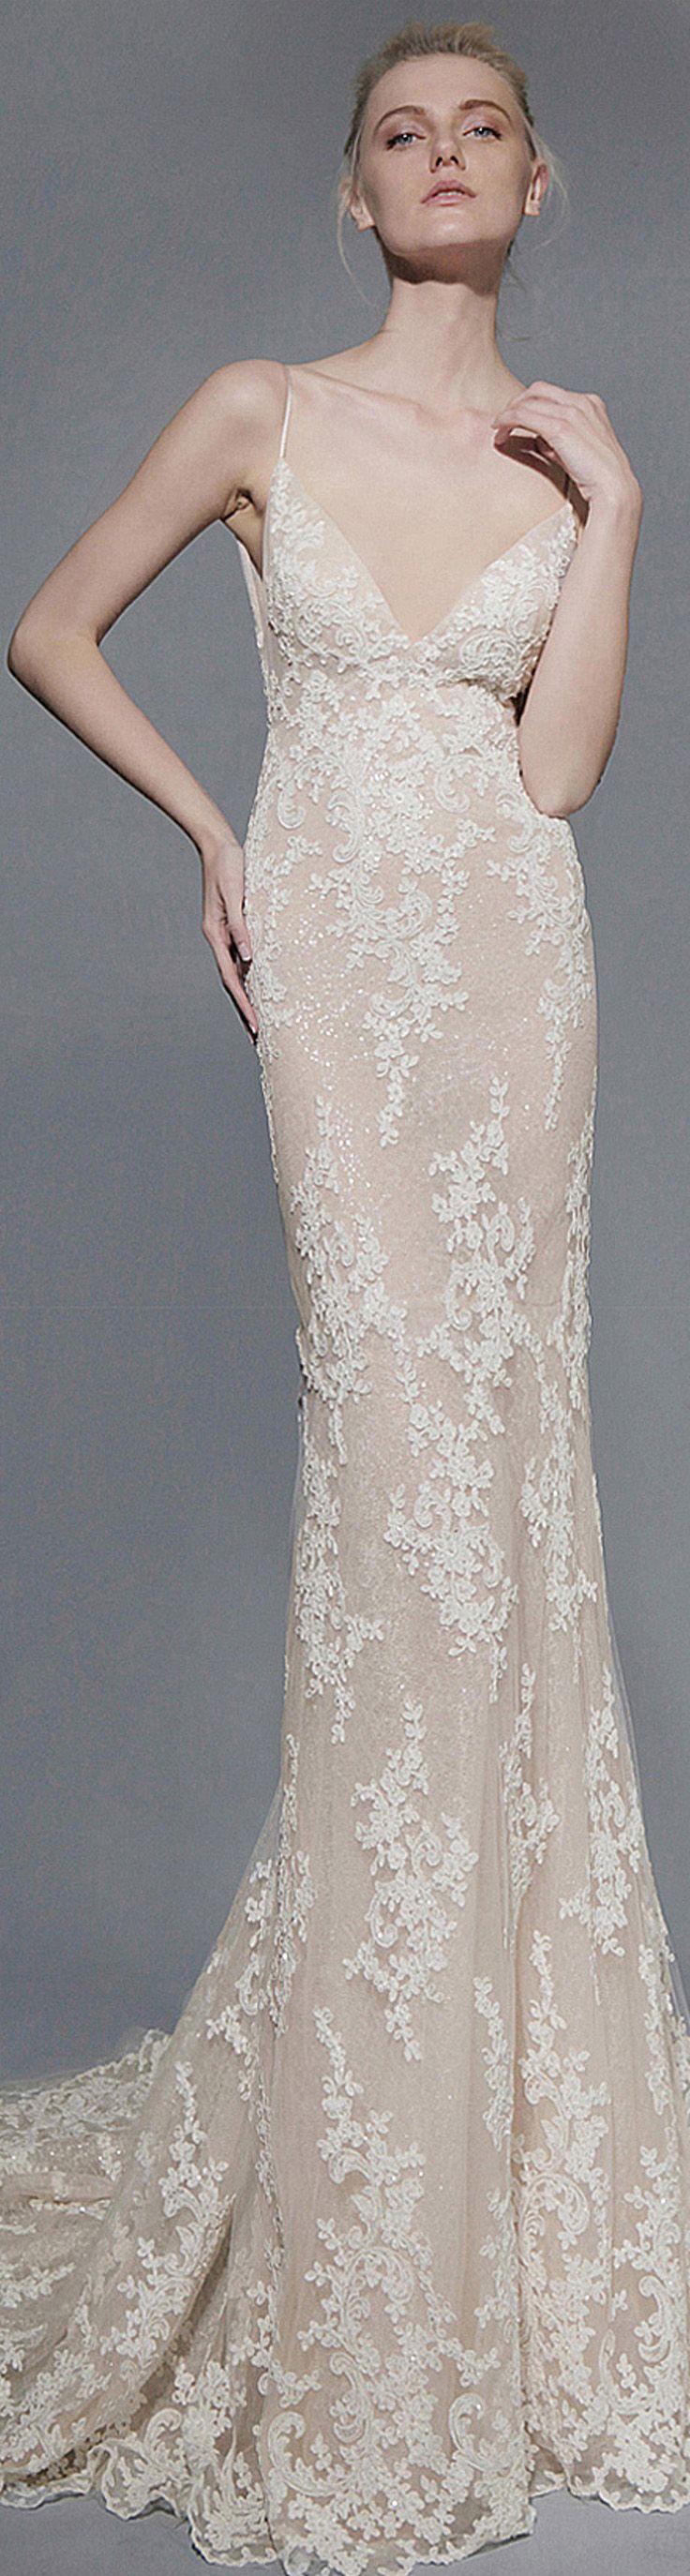 Victoria KyriaKides 2016 Bridal Collection. Iole Dress #saks #bride ...